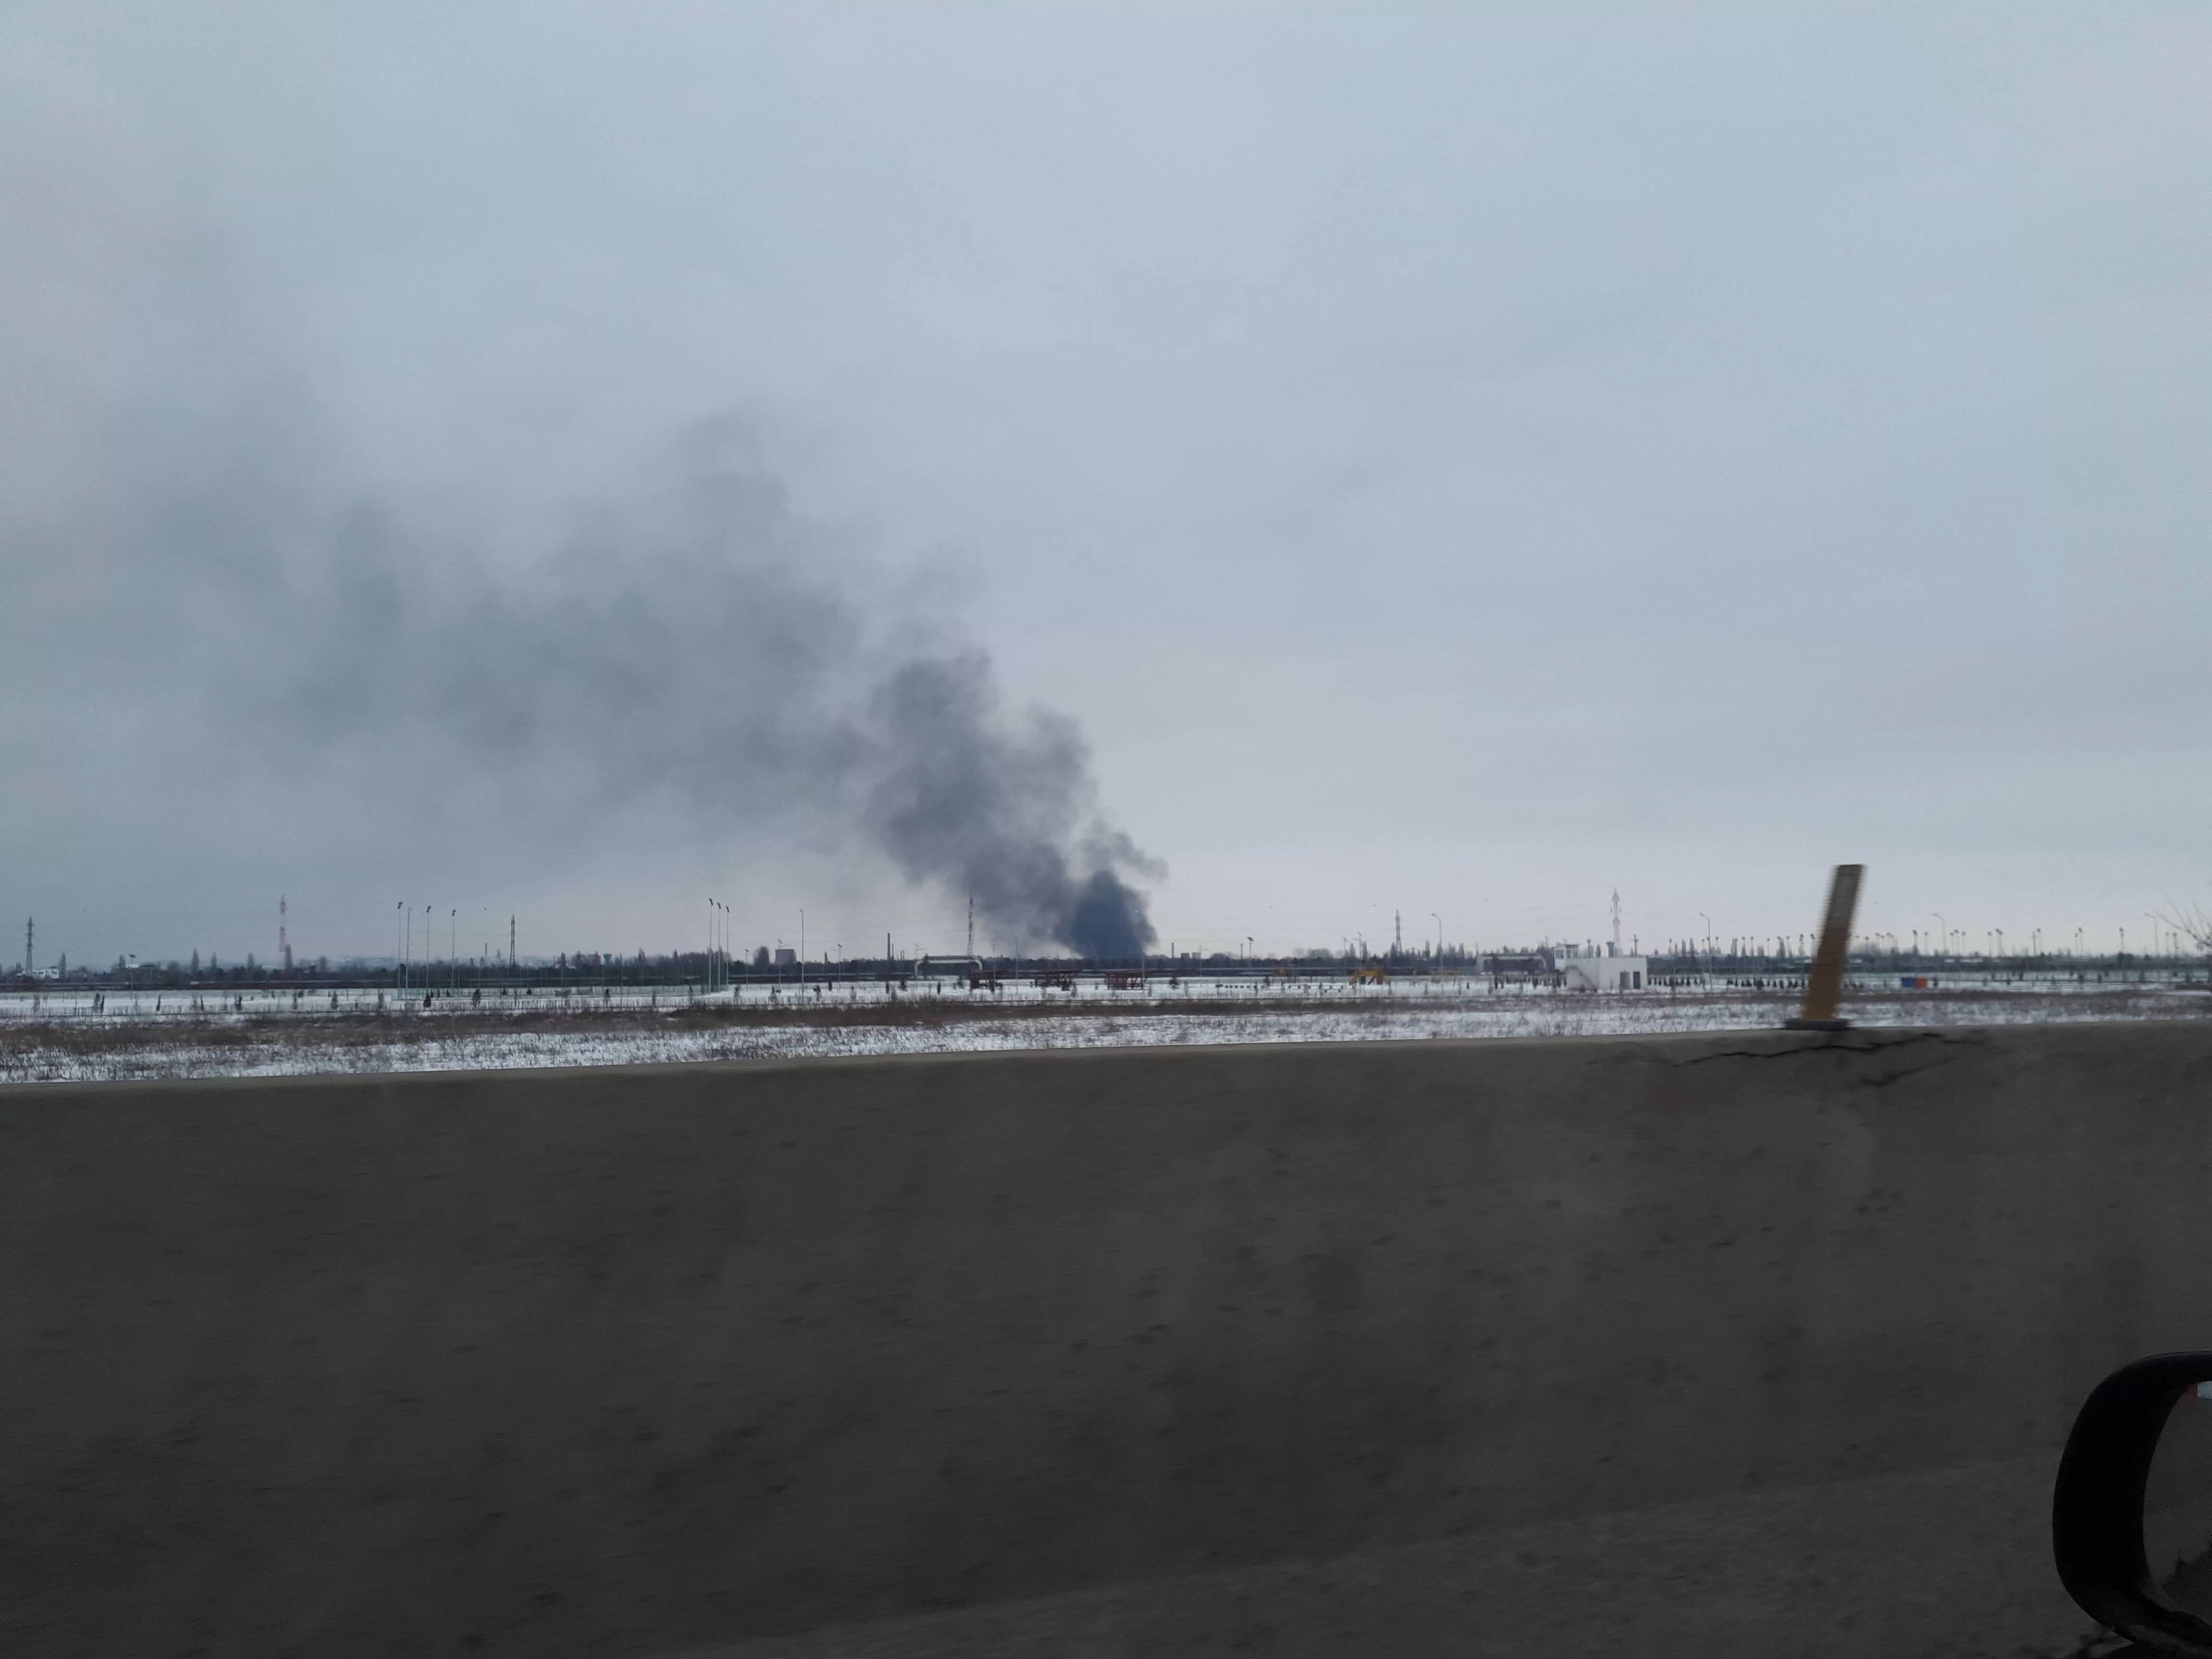 Incendiu la rafinaria Astra. Fumul s-a vazut de la kilometri distanță